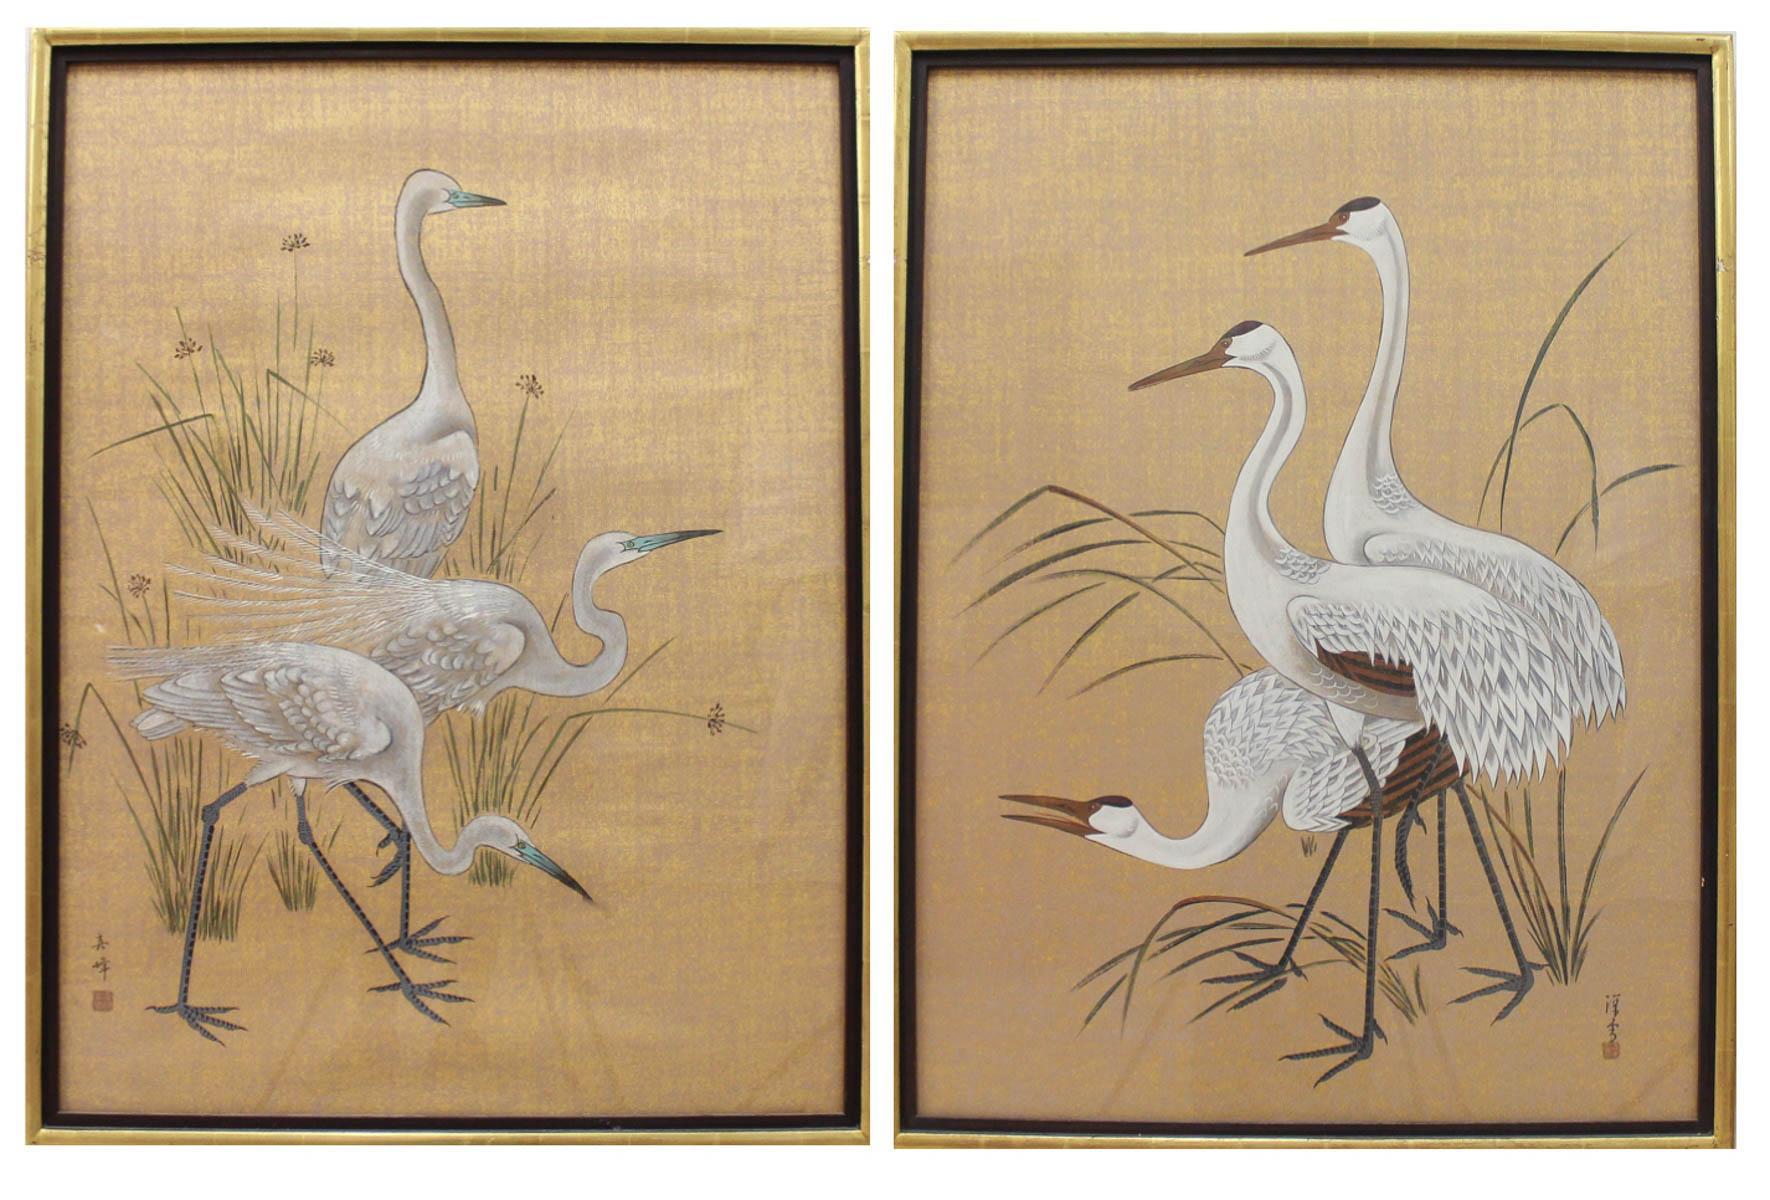 MI CHOU (China, 20th century) two temperas on pape